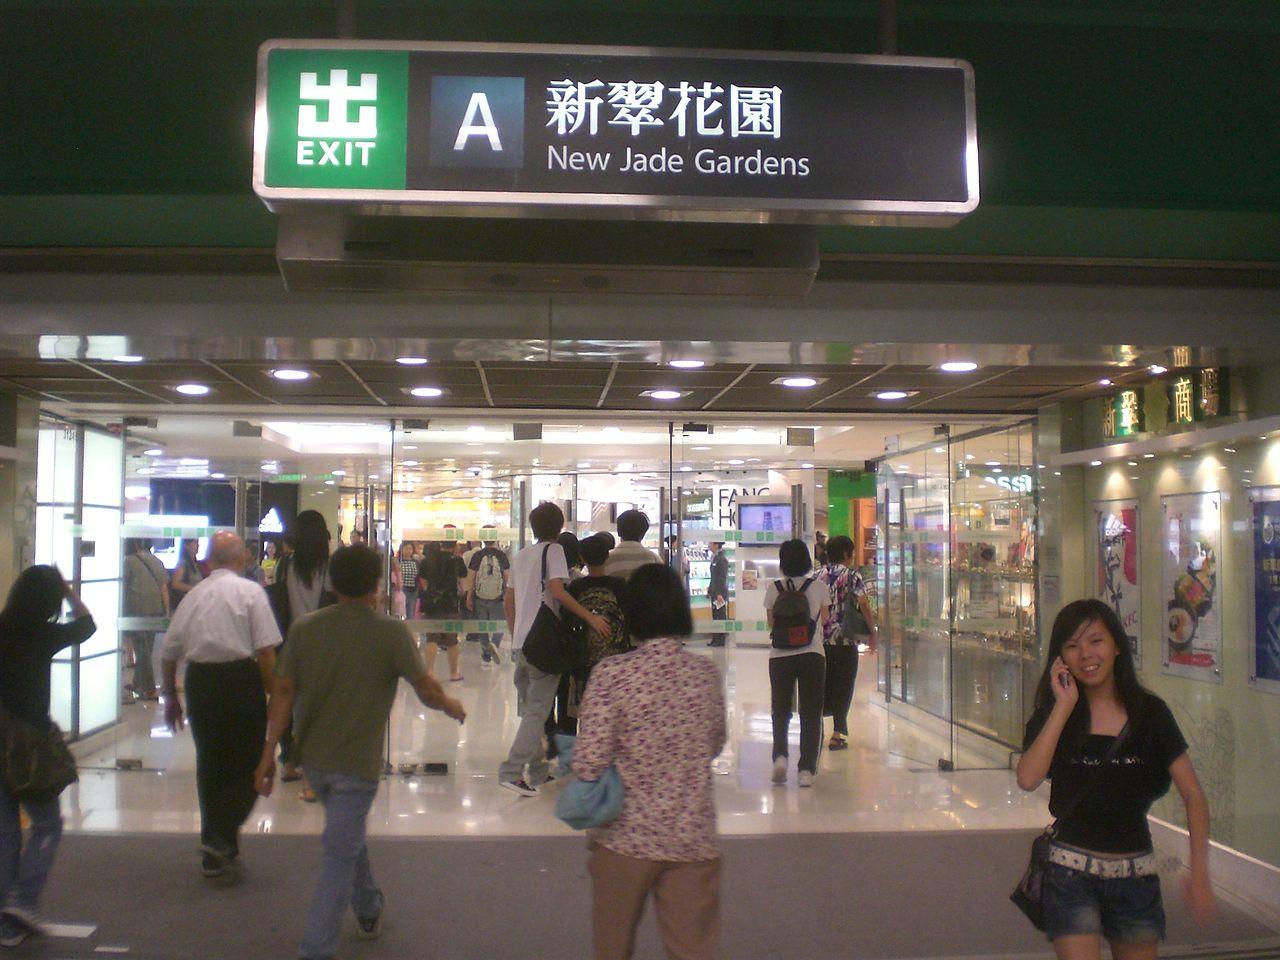 File:HK Chai Wan 新翠花園 New Jade Gardens MTR Exit Visitors.JPG